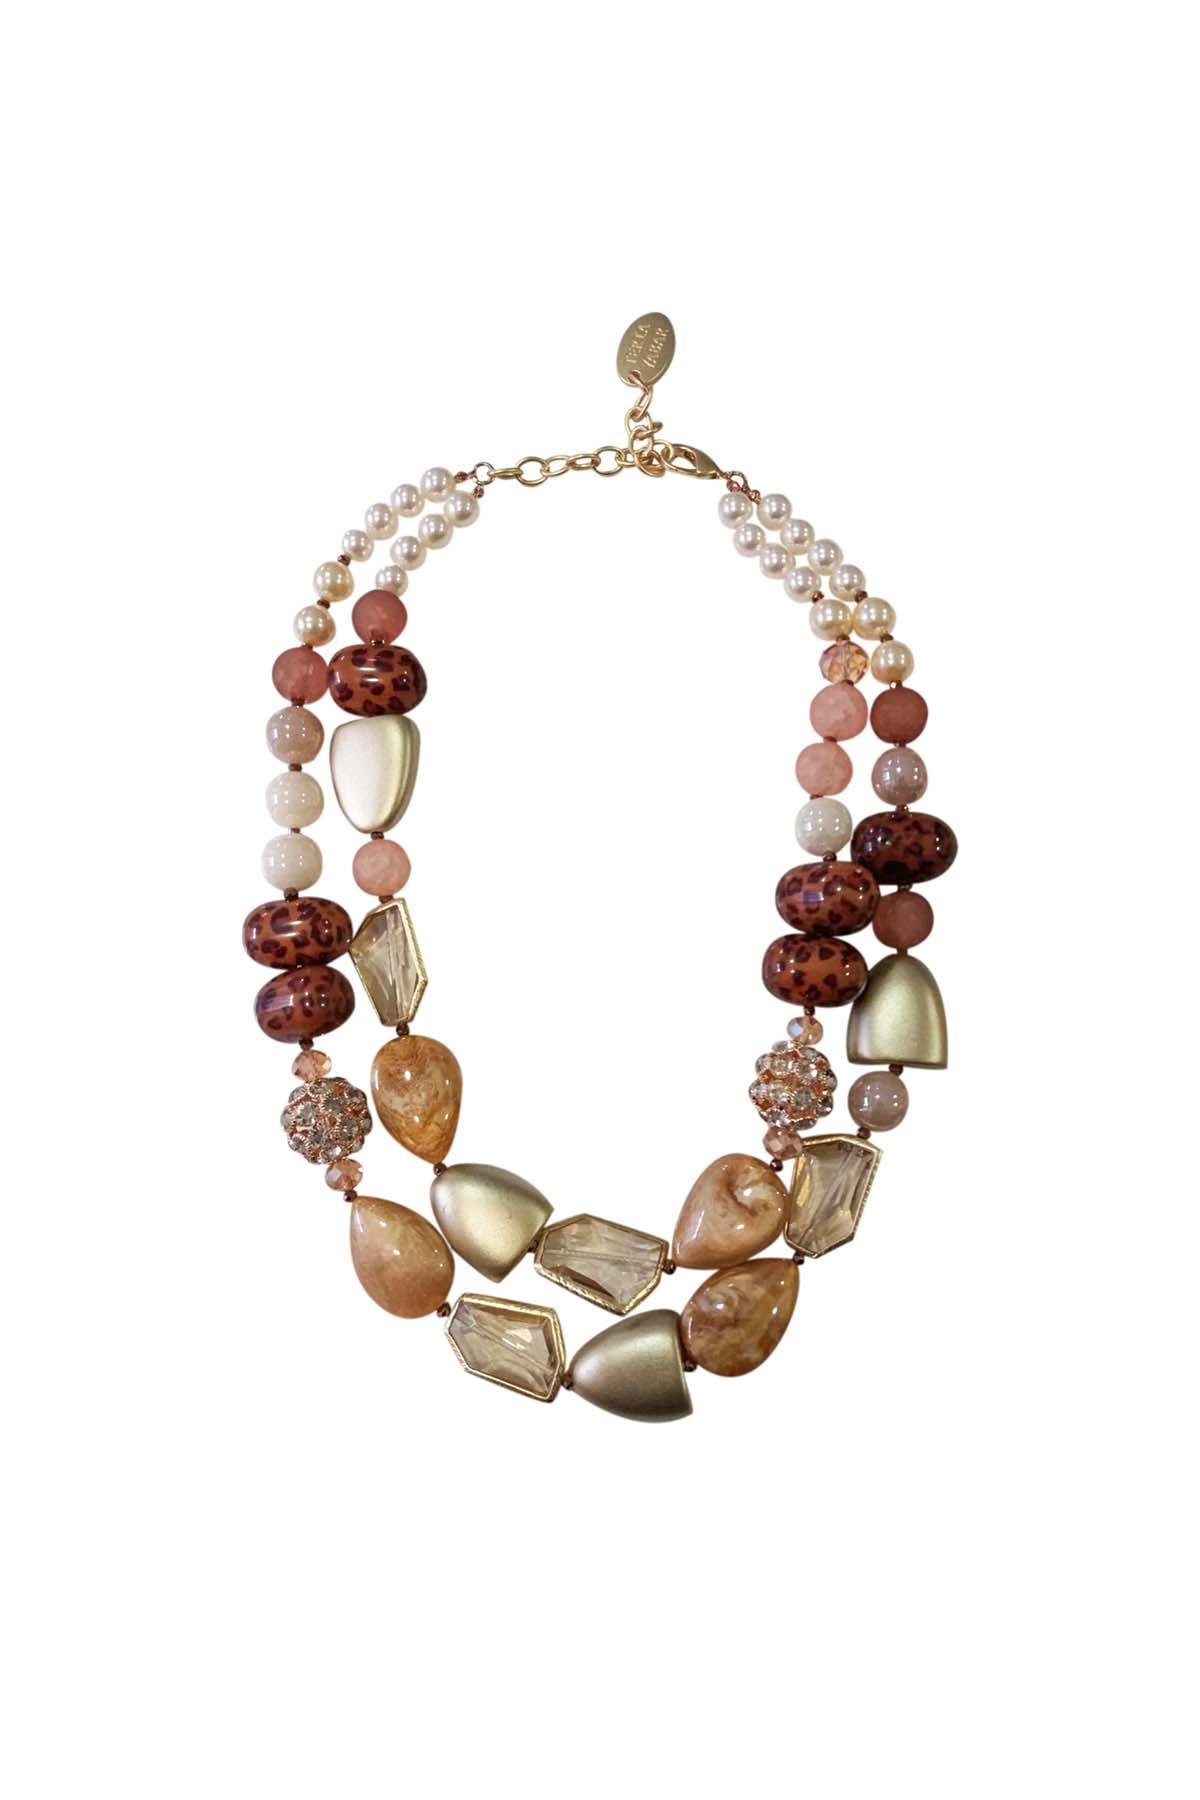 Teria Yabar - Collar tribal en tonos tierra